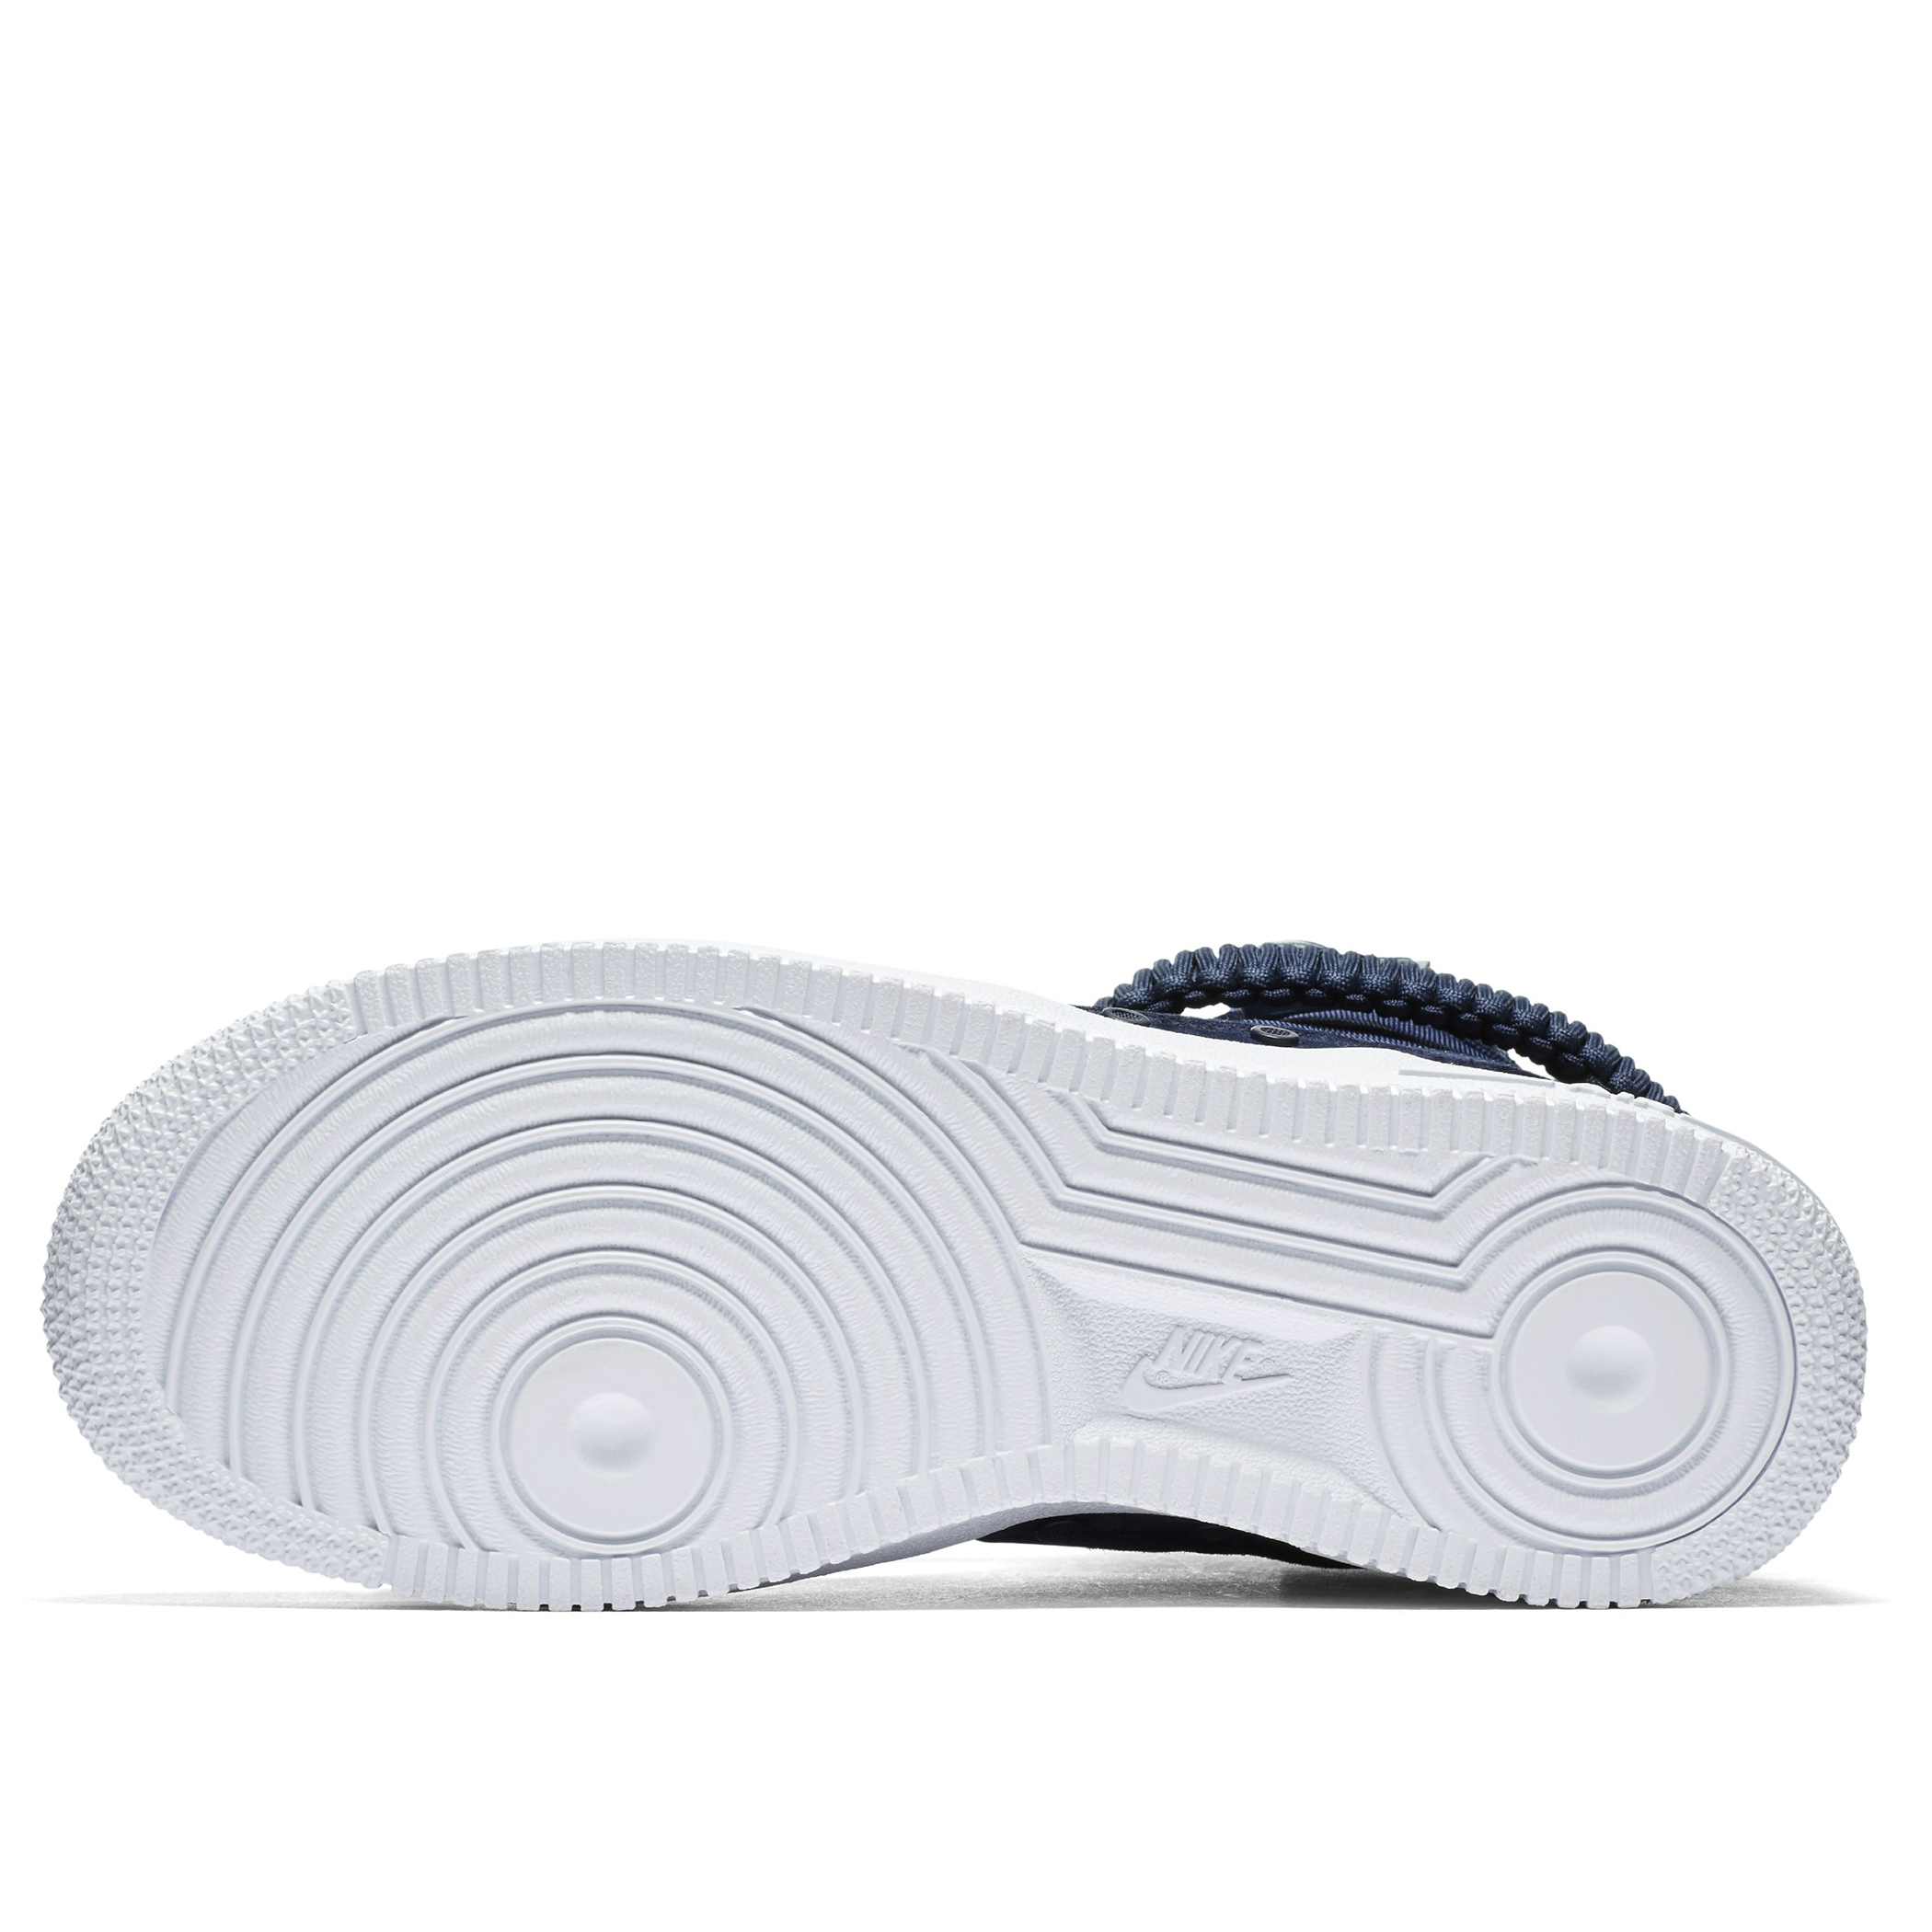 c71770c483f5 Женские кроссовки Nike SF Air Force 1 Midnight Navy Midnight Navy-White -  фото